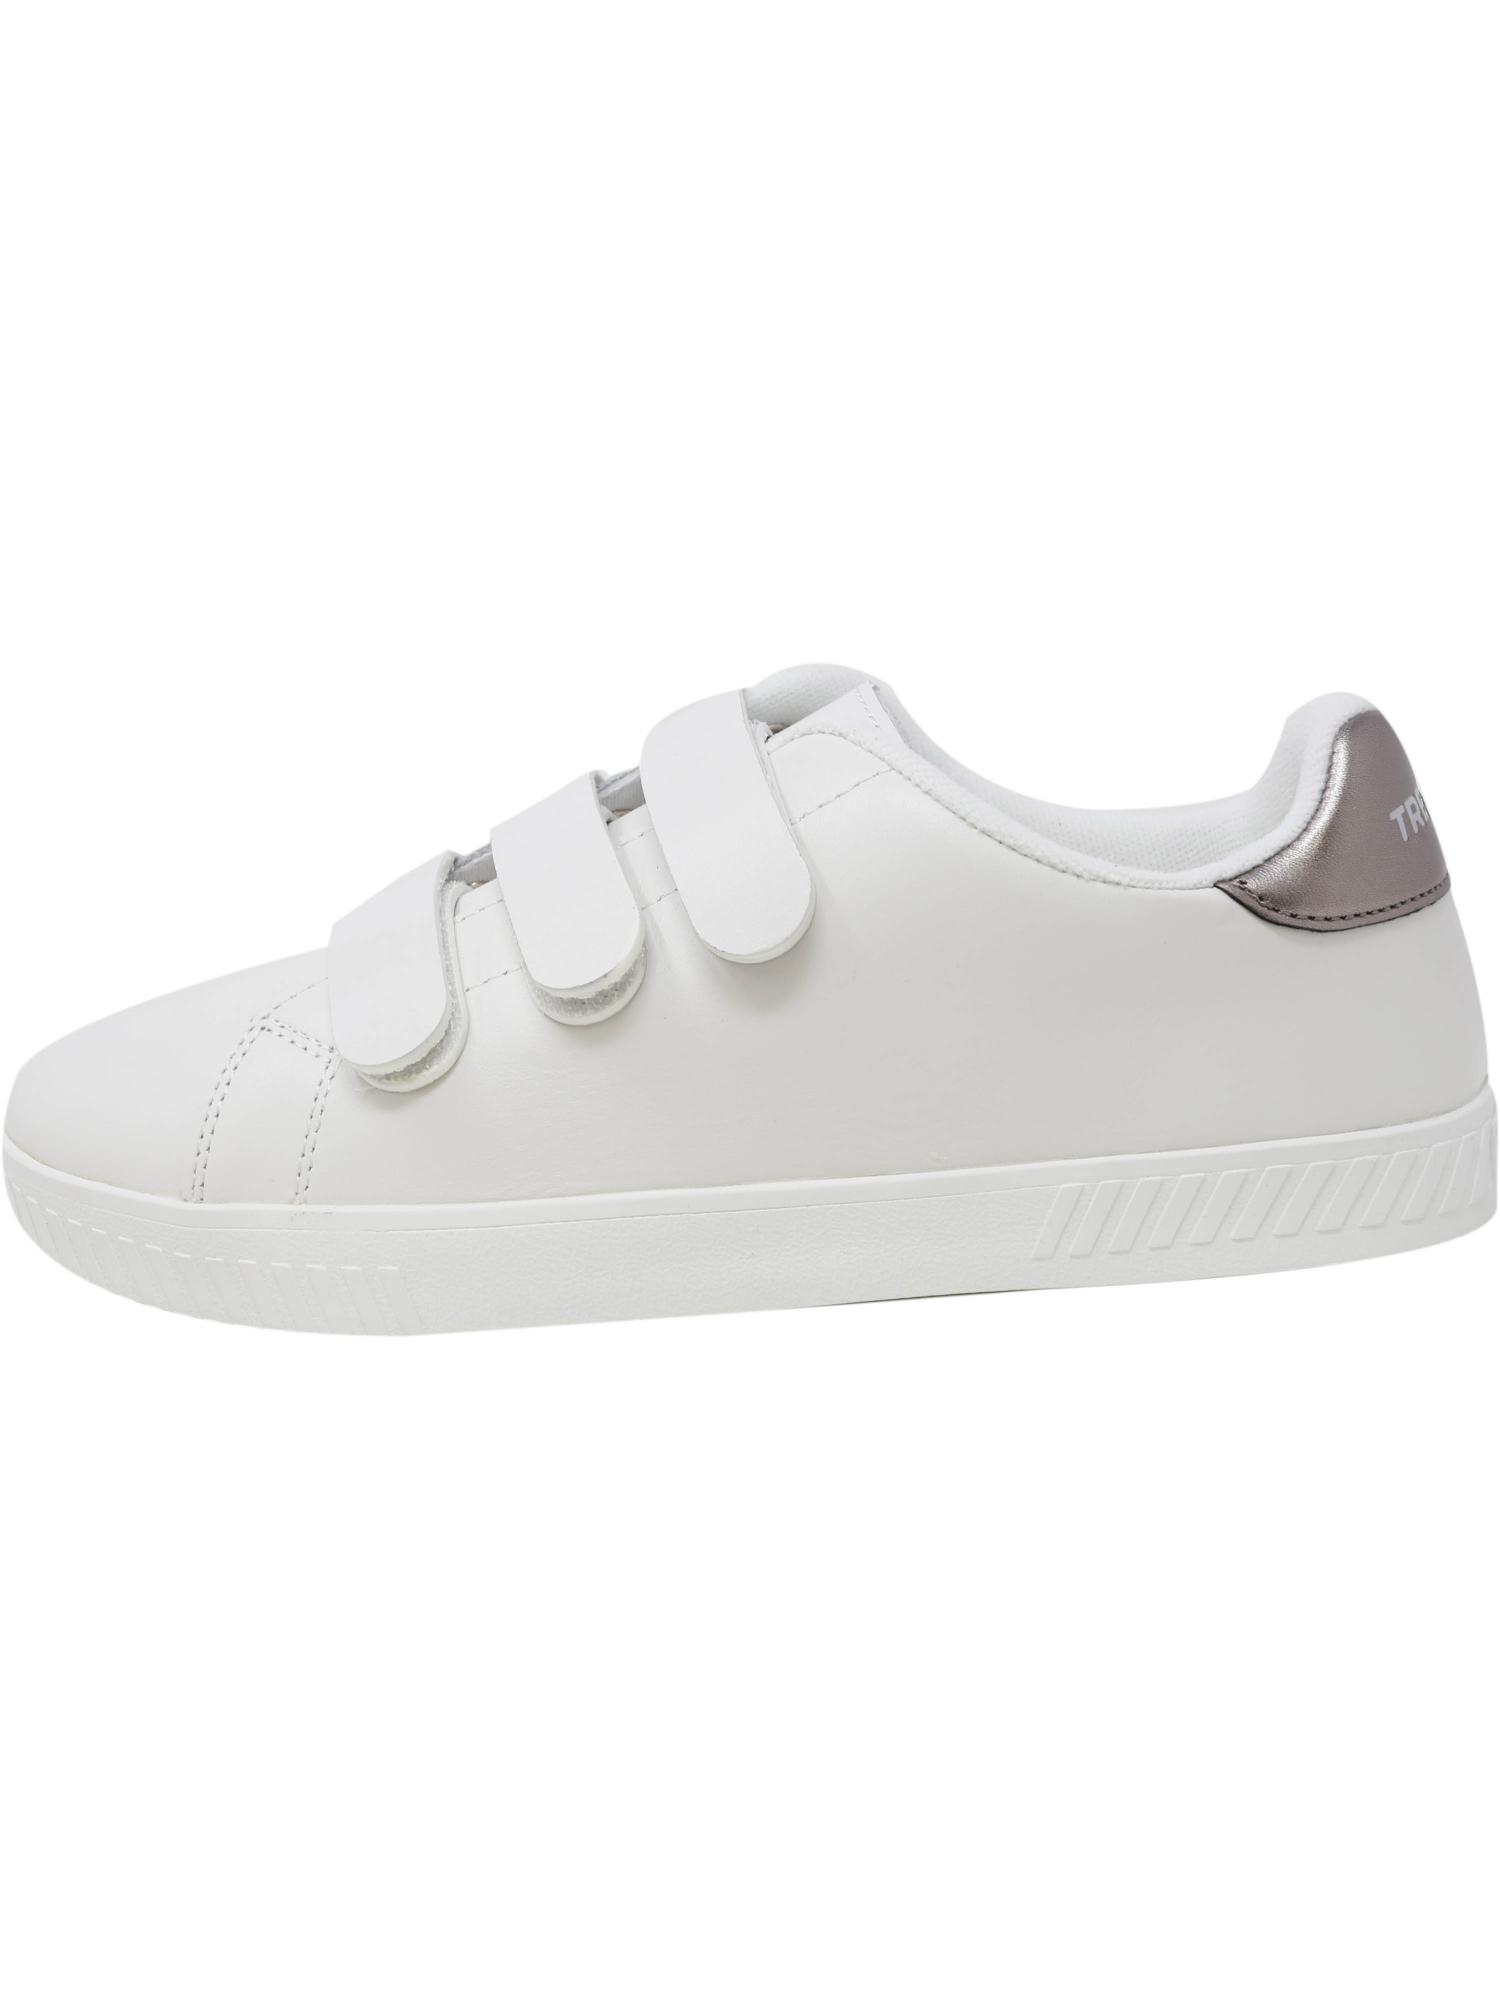 Homme-Tretorn-Transporter-2-en-Cuir-Cheville-High-Fashion-Sneaker miniature 8